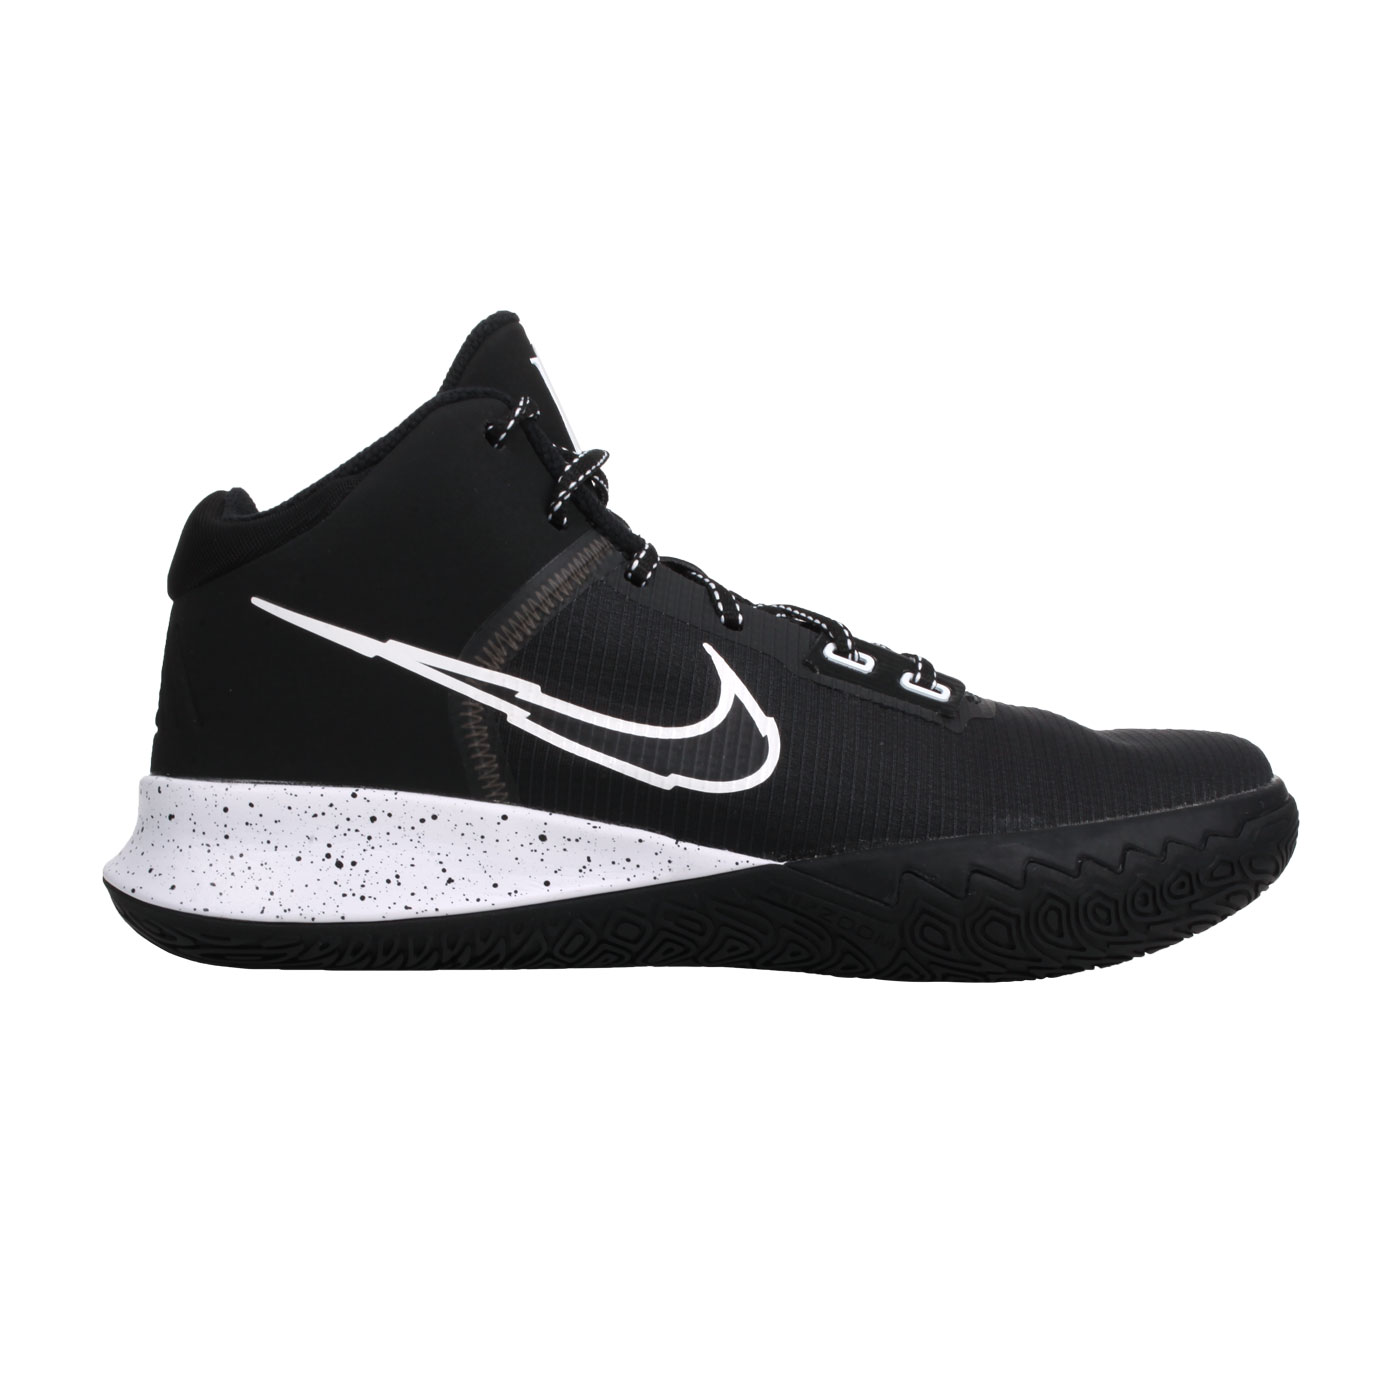 NIKE 男款籃球鞋 CT1973001